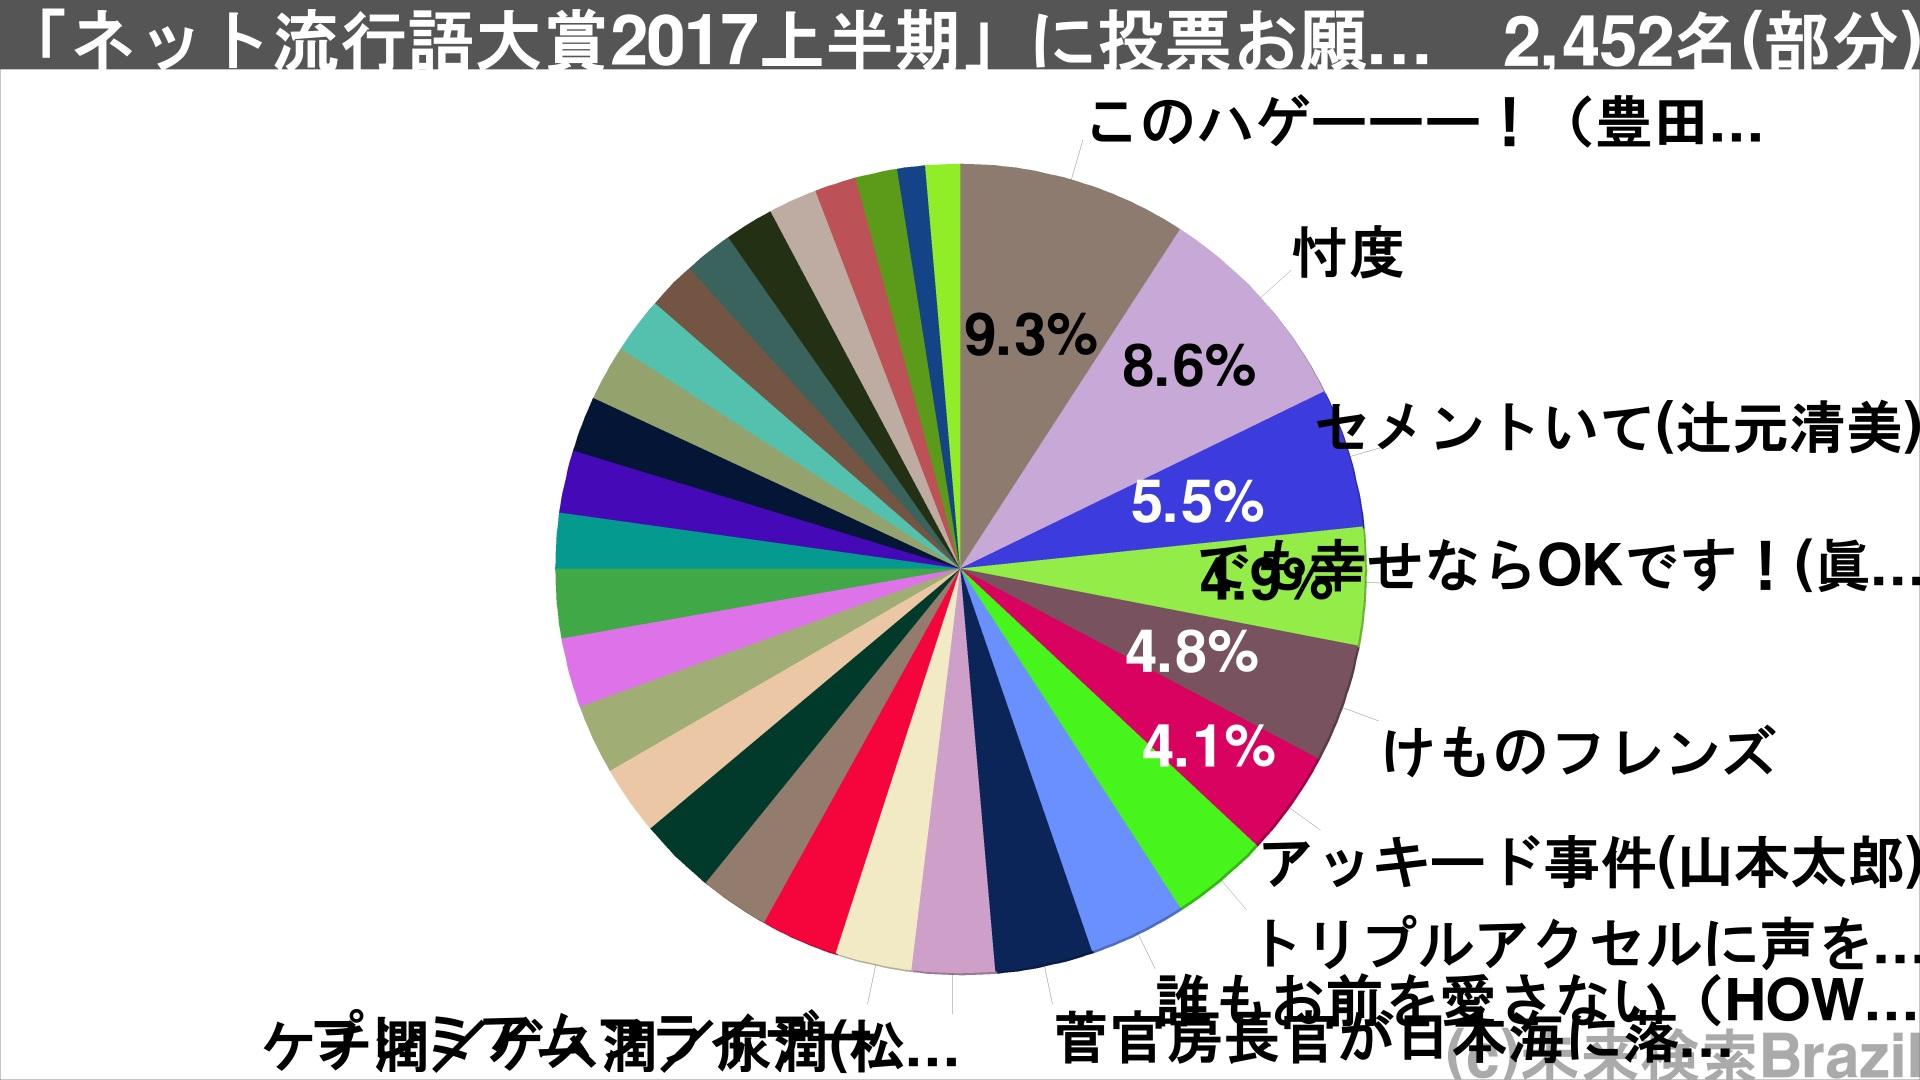 %e3%83%8d%e3%83%83%e3%83%882017%e4%b8%8a%e5%8d%8a%e6%9c%9f